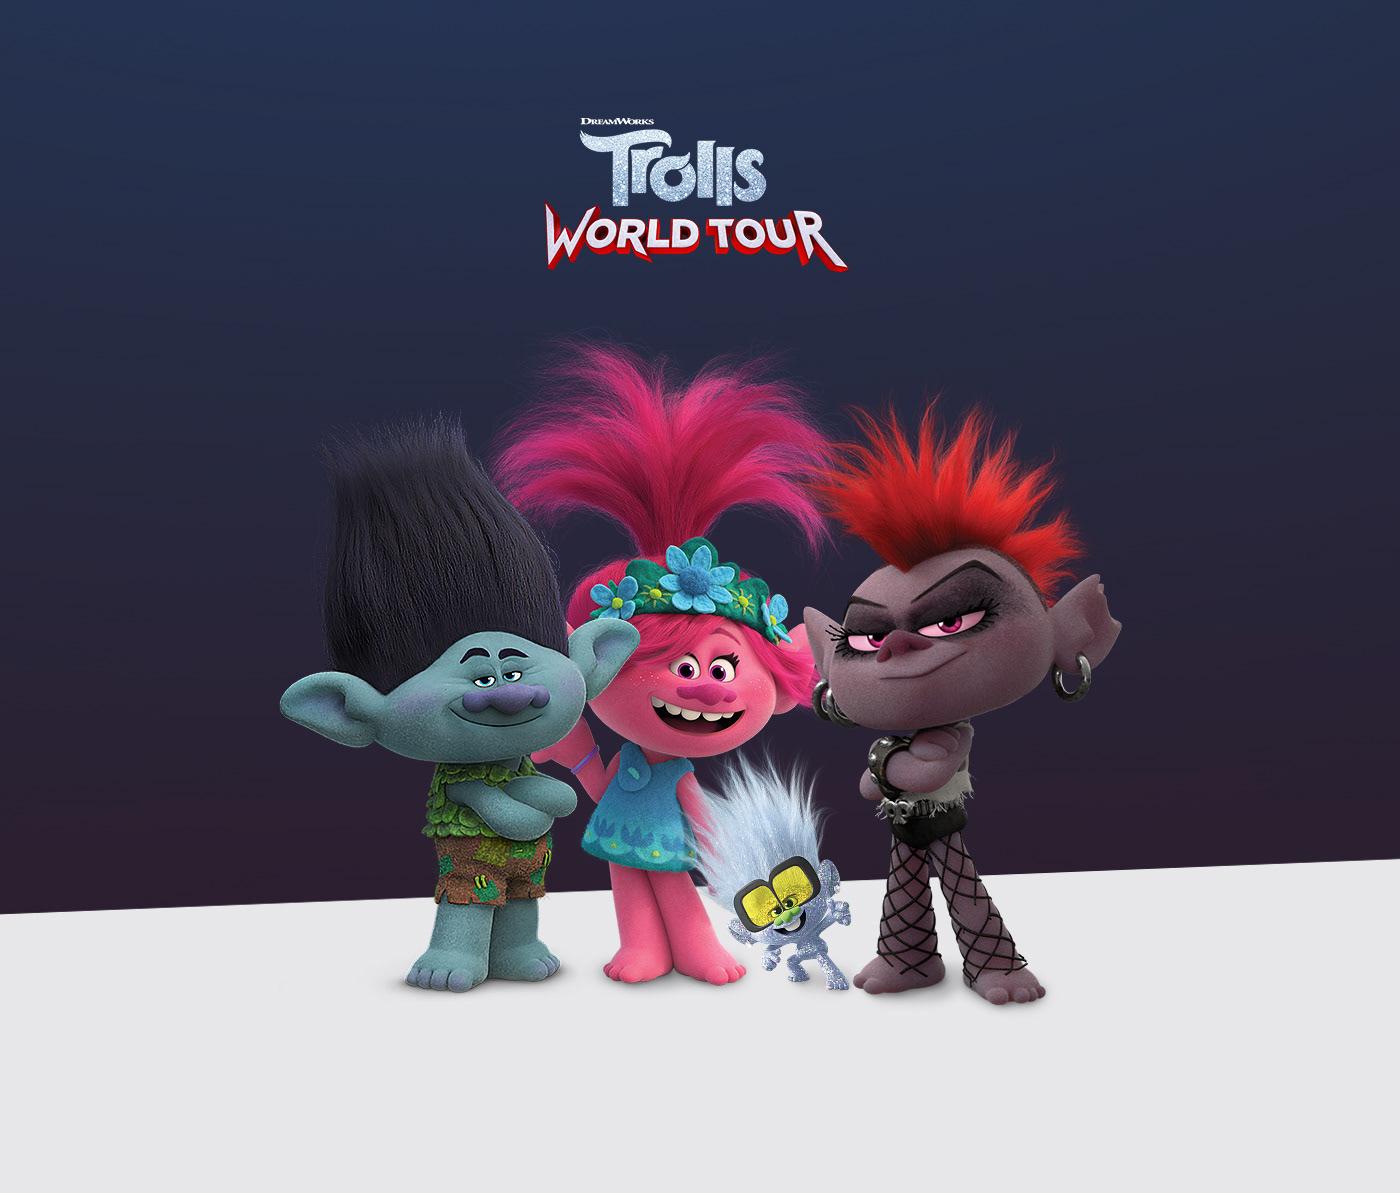 Trolls movie AR game kids